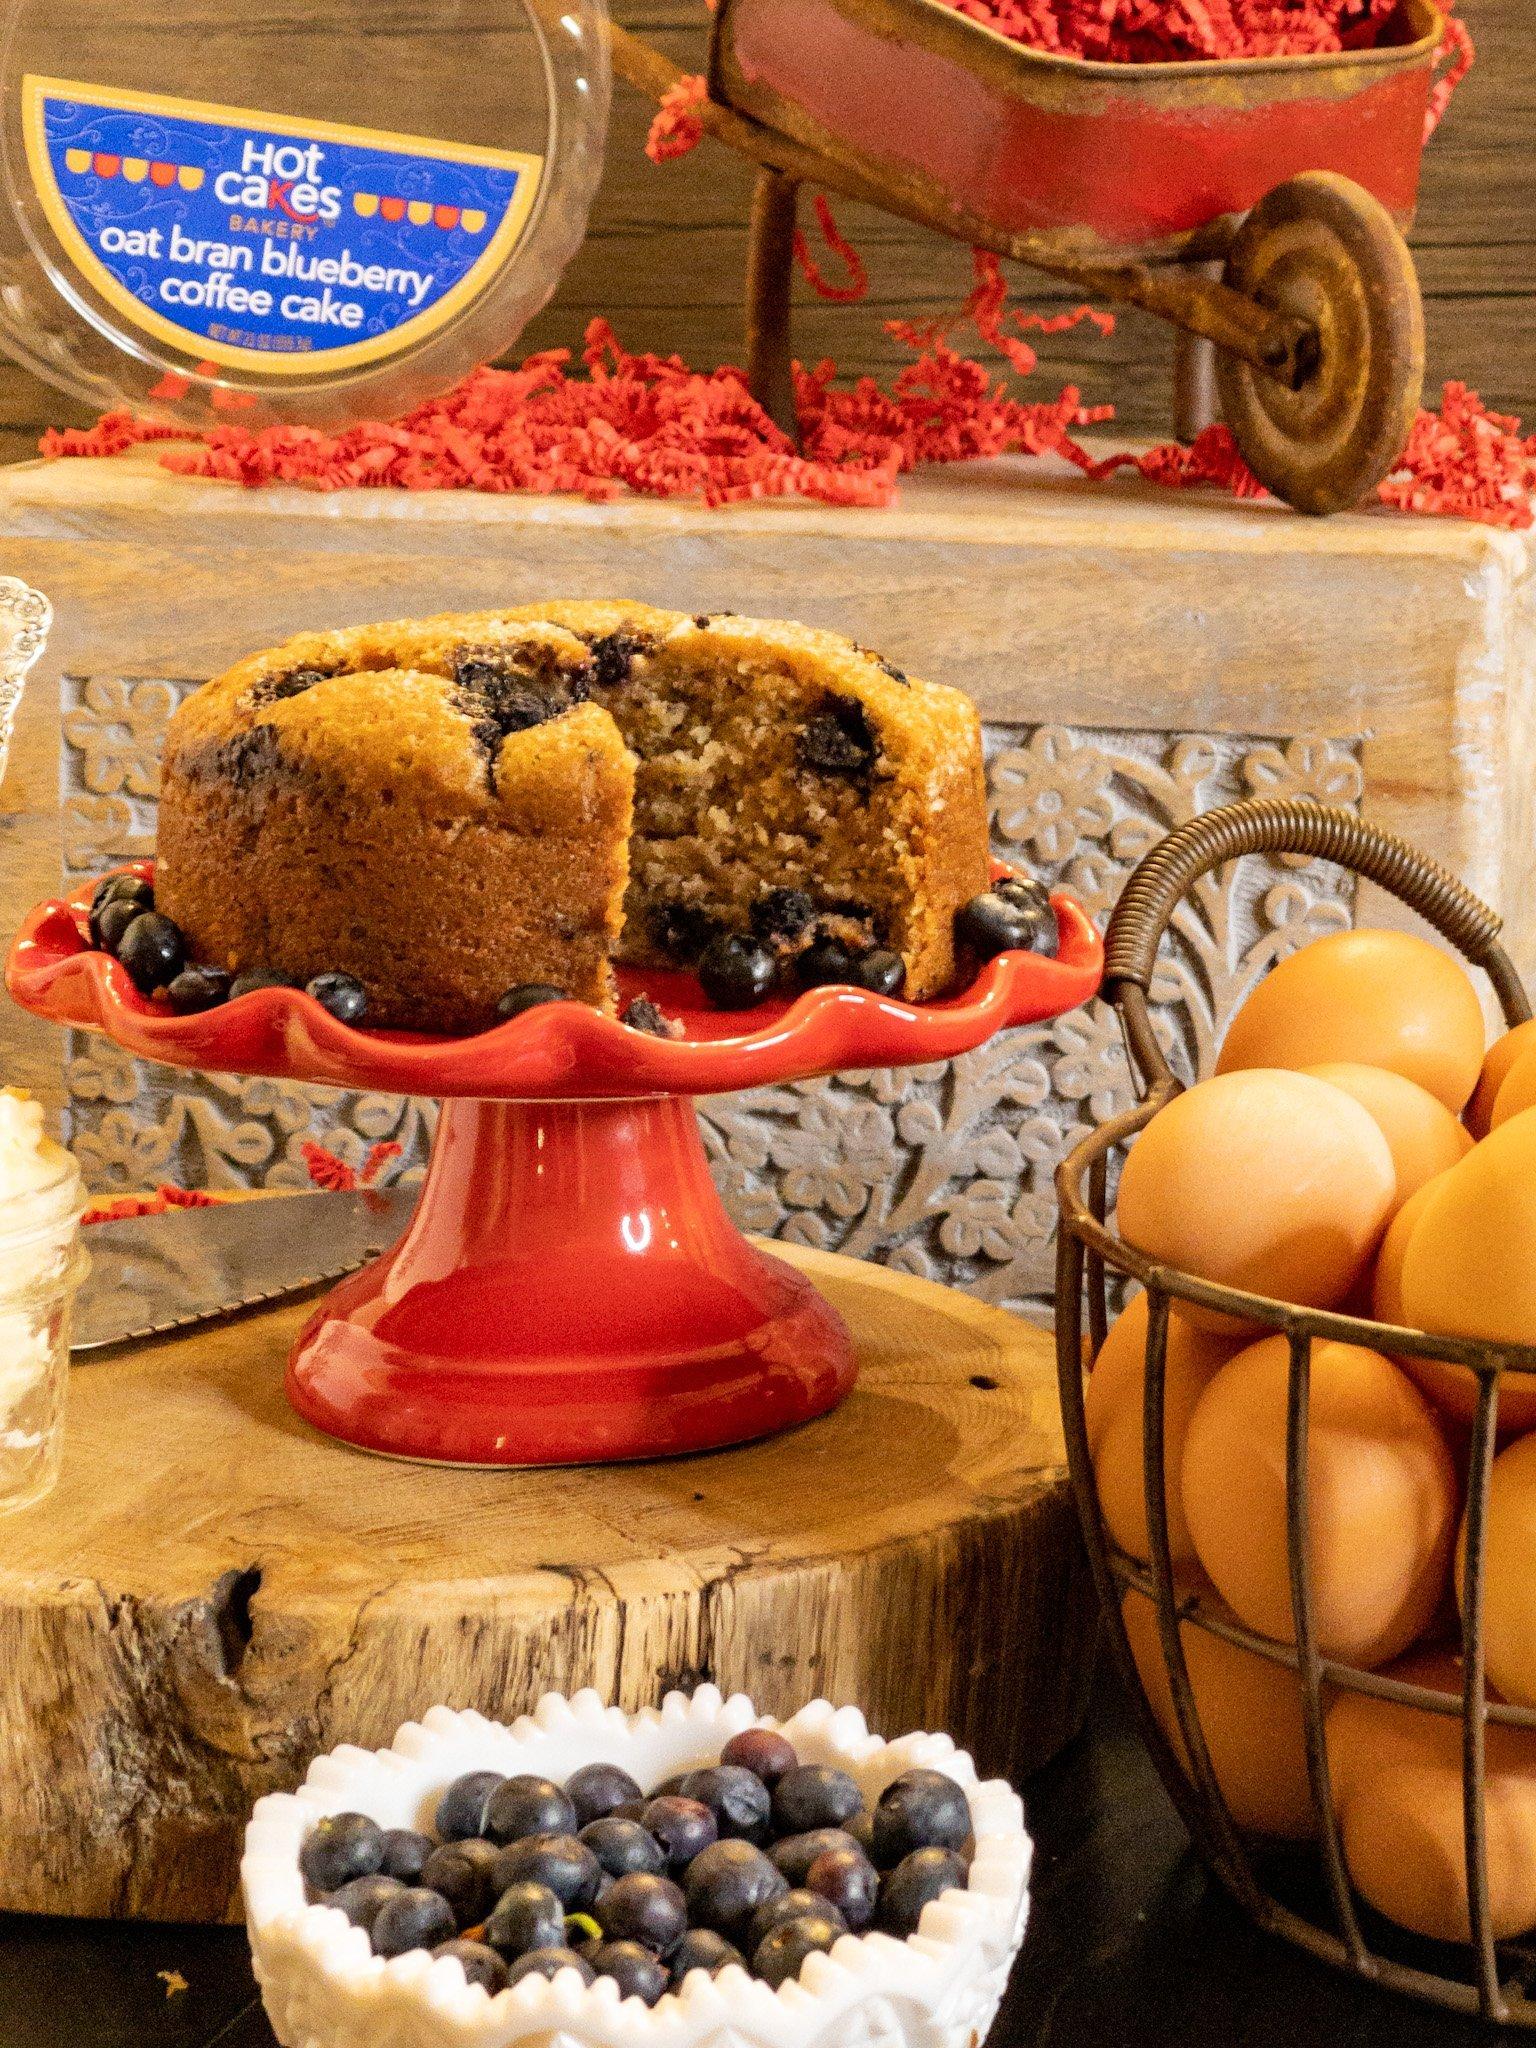 Hot Cakes Bakery - Oat Bran Blueberry Coffee Cake 1